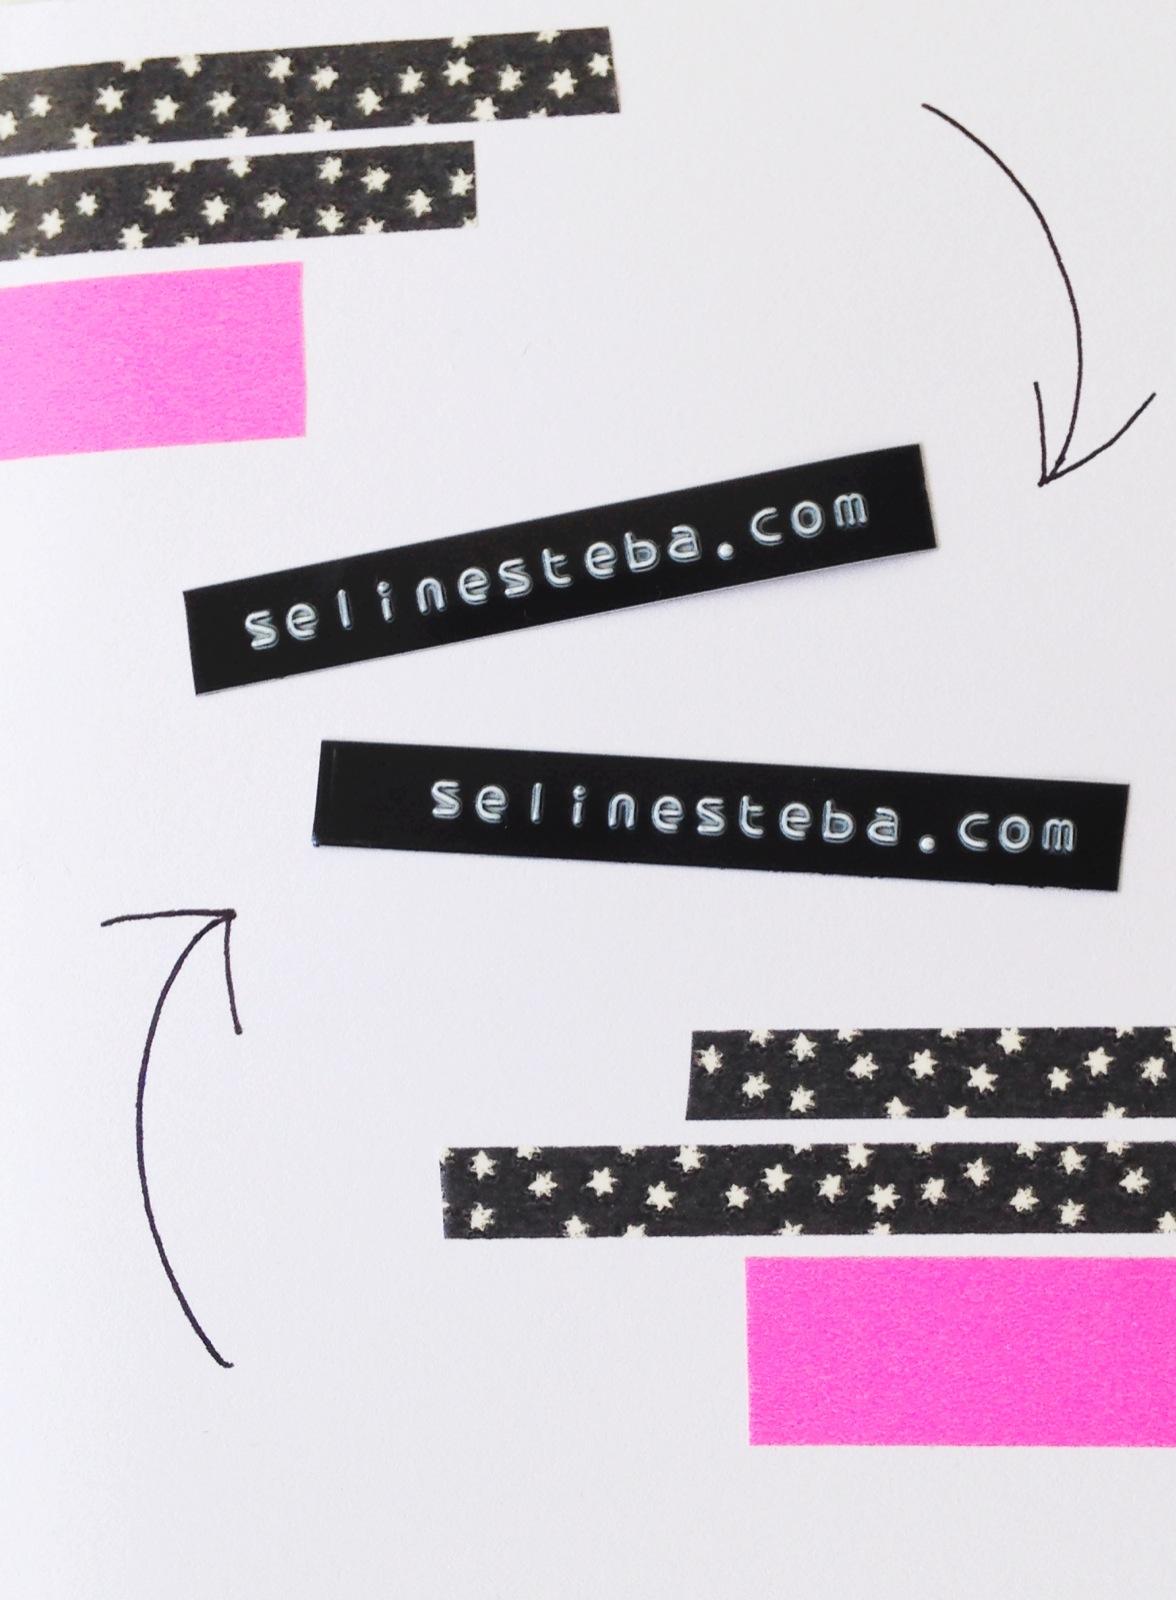 selinesteba.com - img-4442